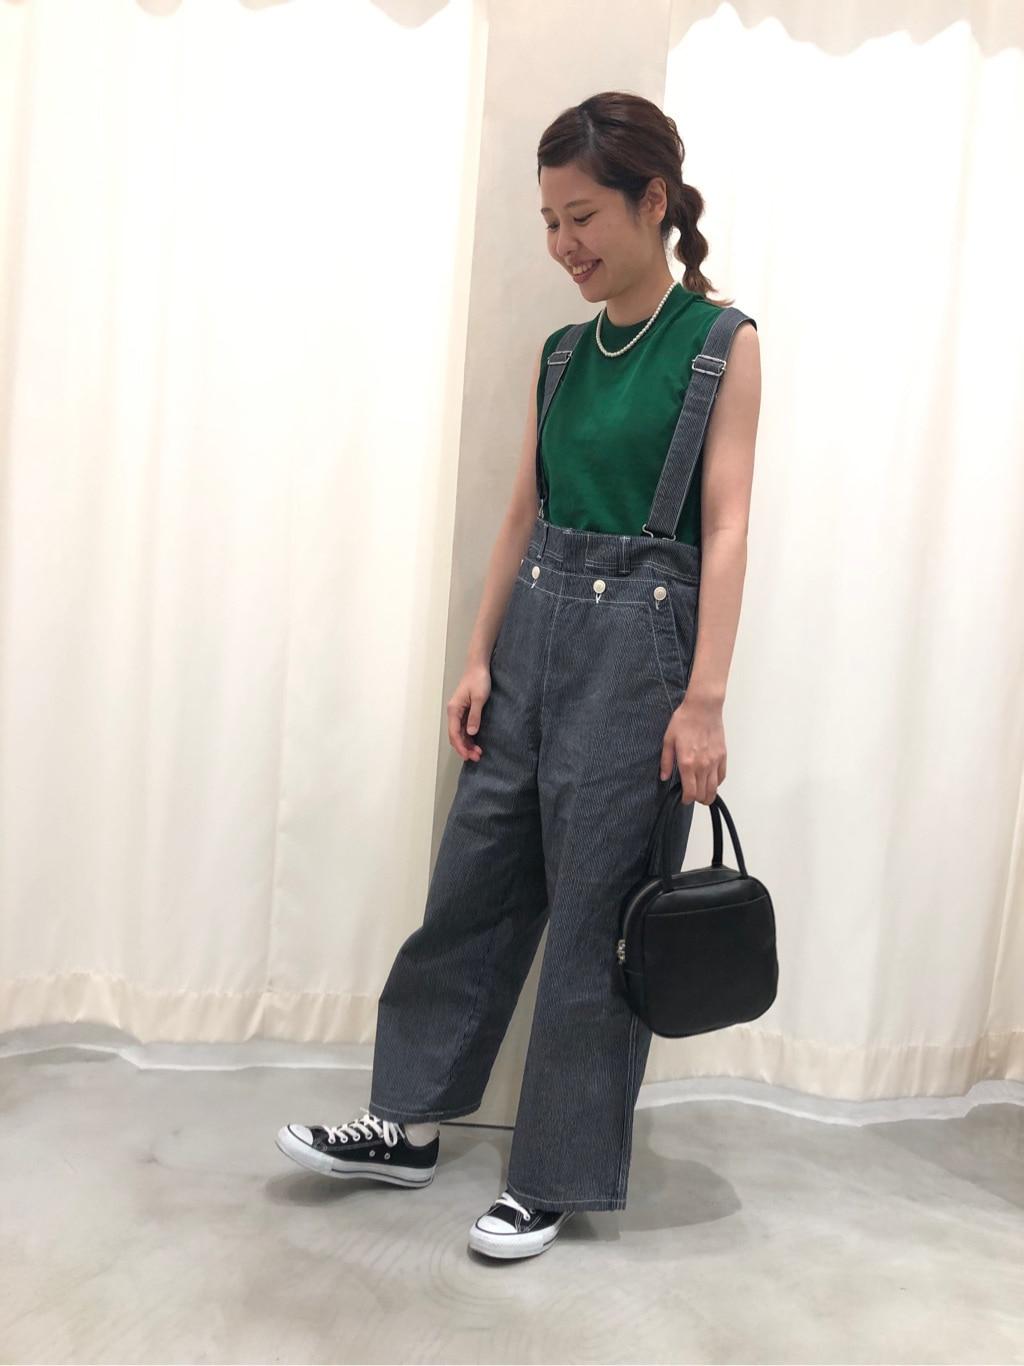 AMB SHOP CHILD WOMAN CHILD WOMAN , PAR ICI 東京スカイツリータウン・ソラマチ 身長:160cm 2020.07.22